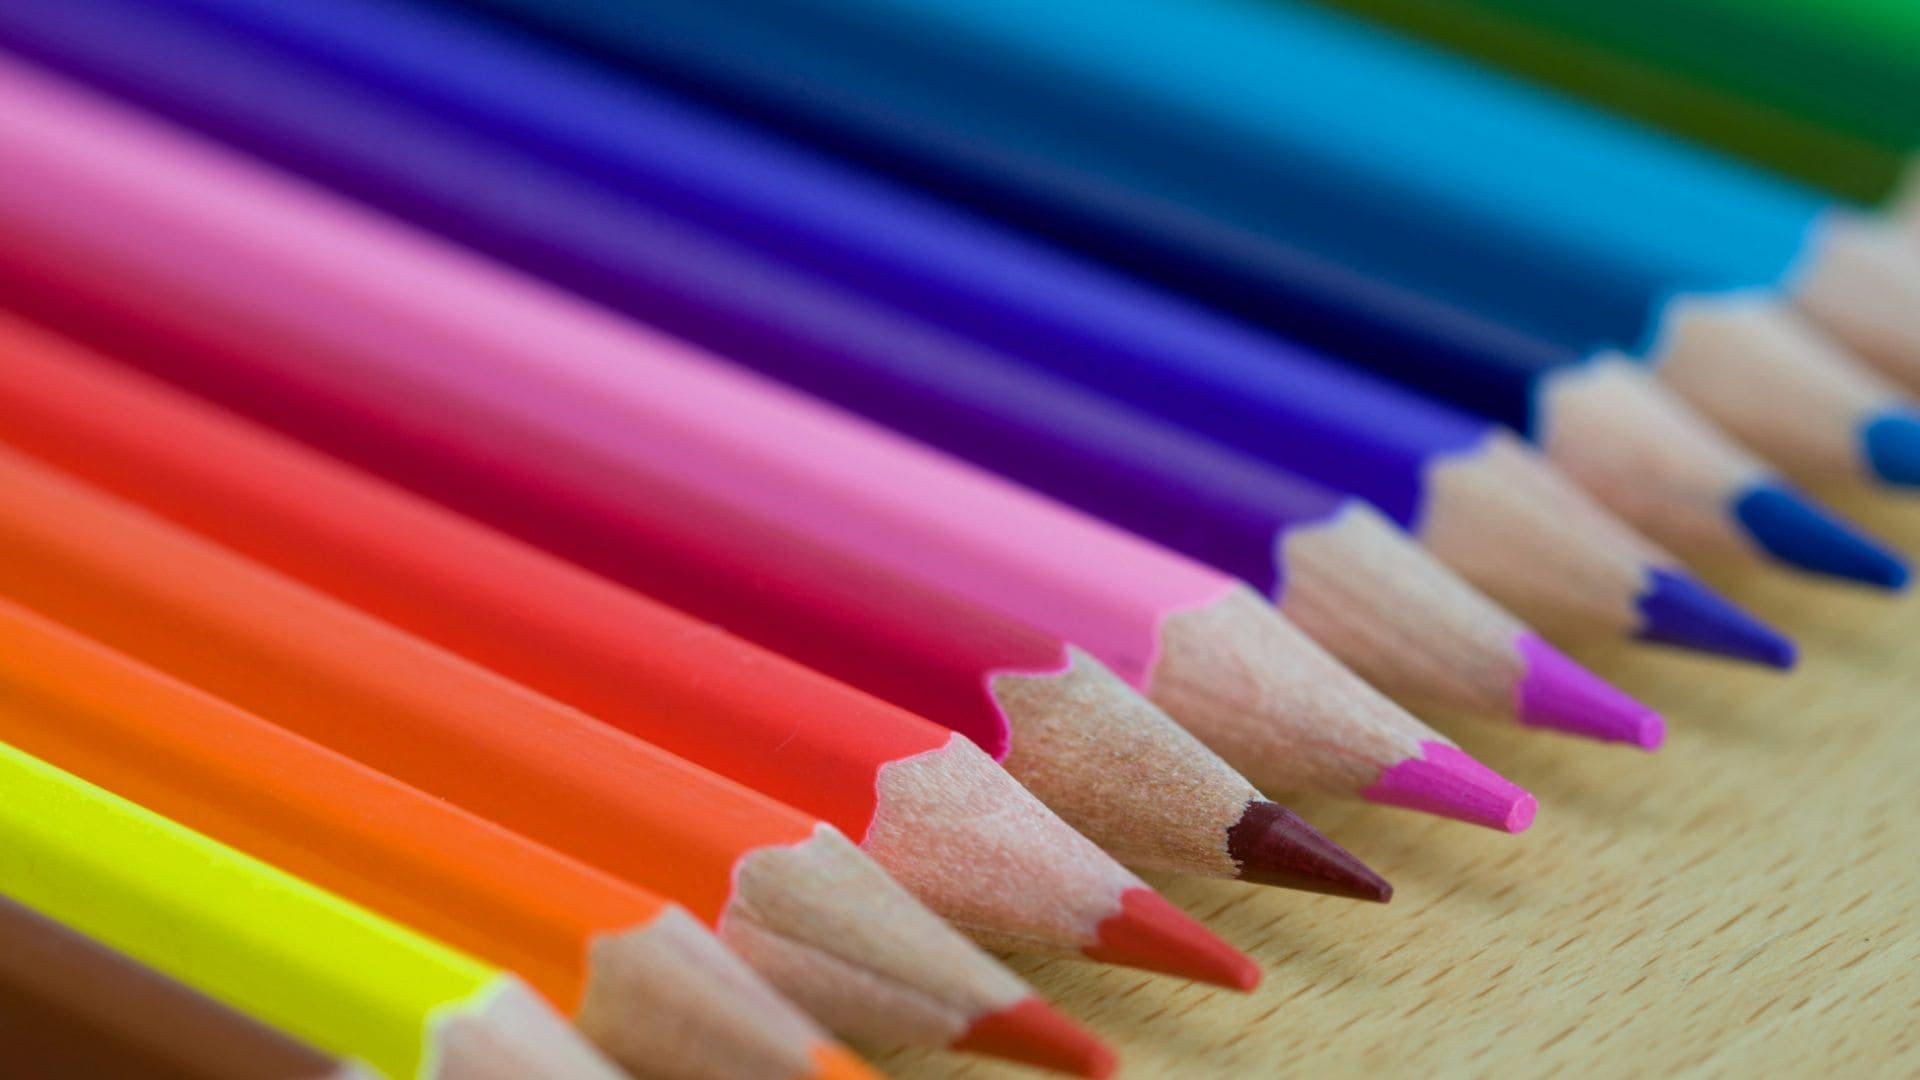 lapis-de-desenho-para-colorir